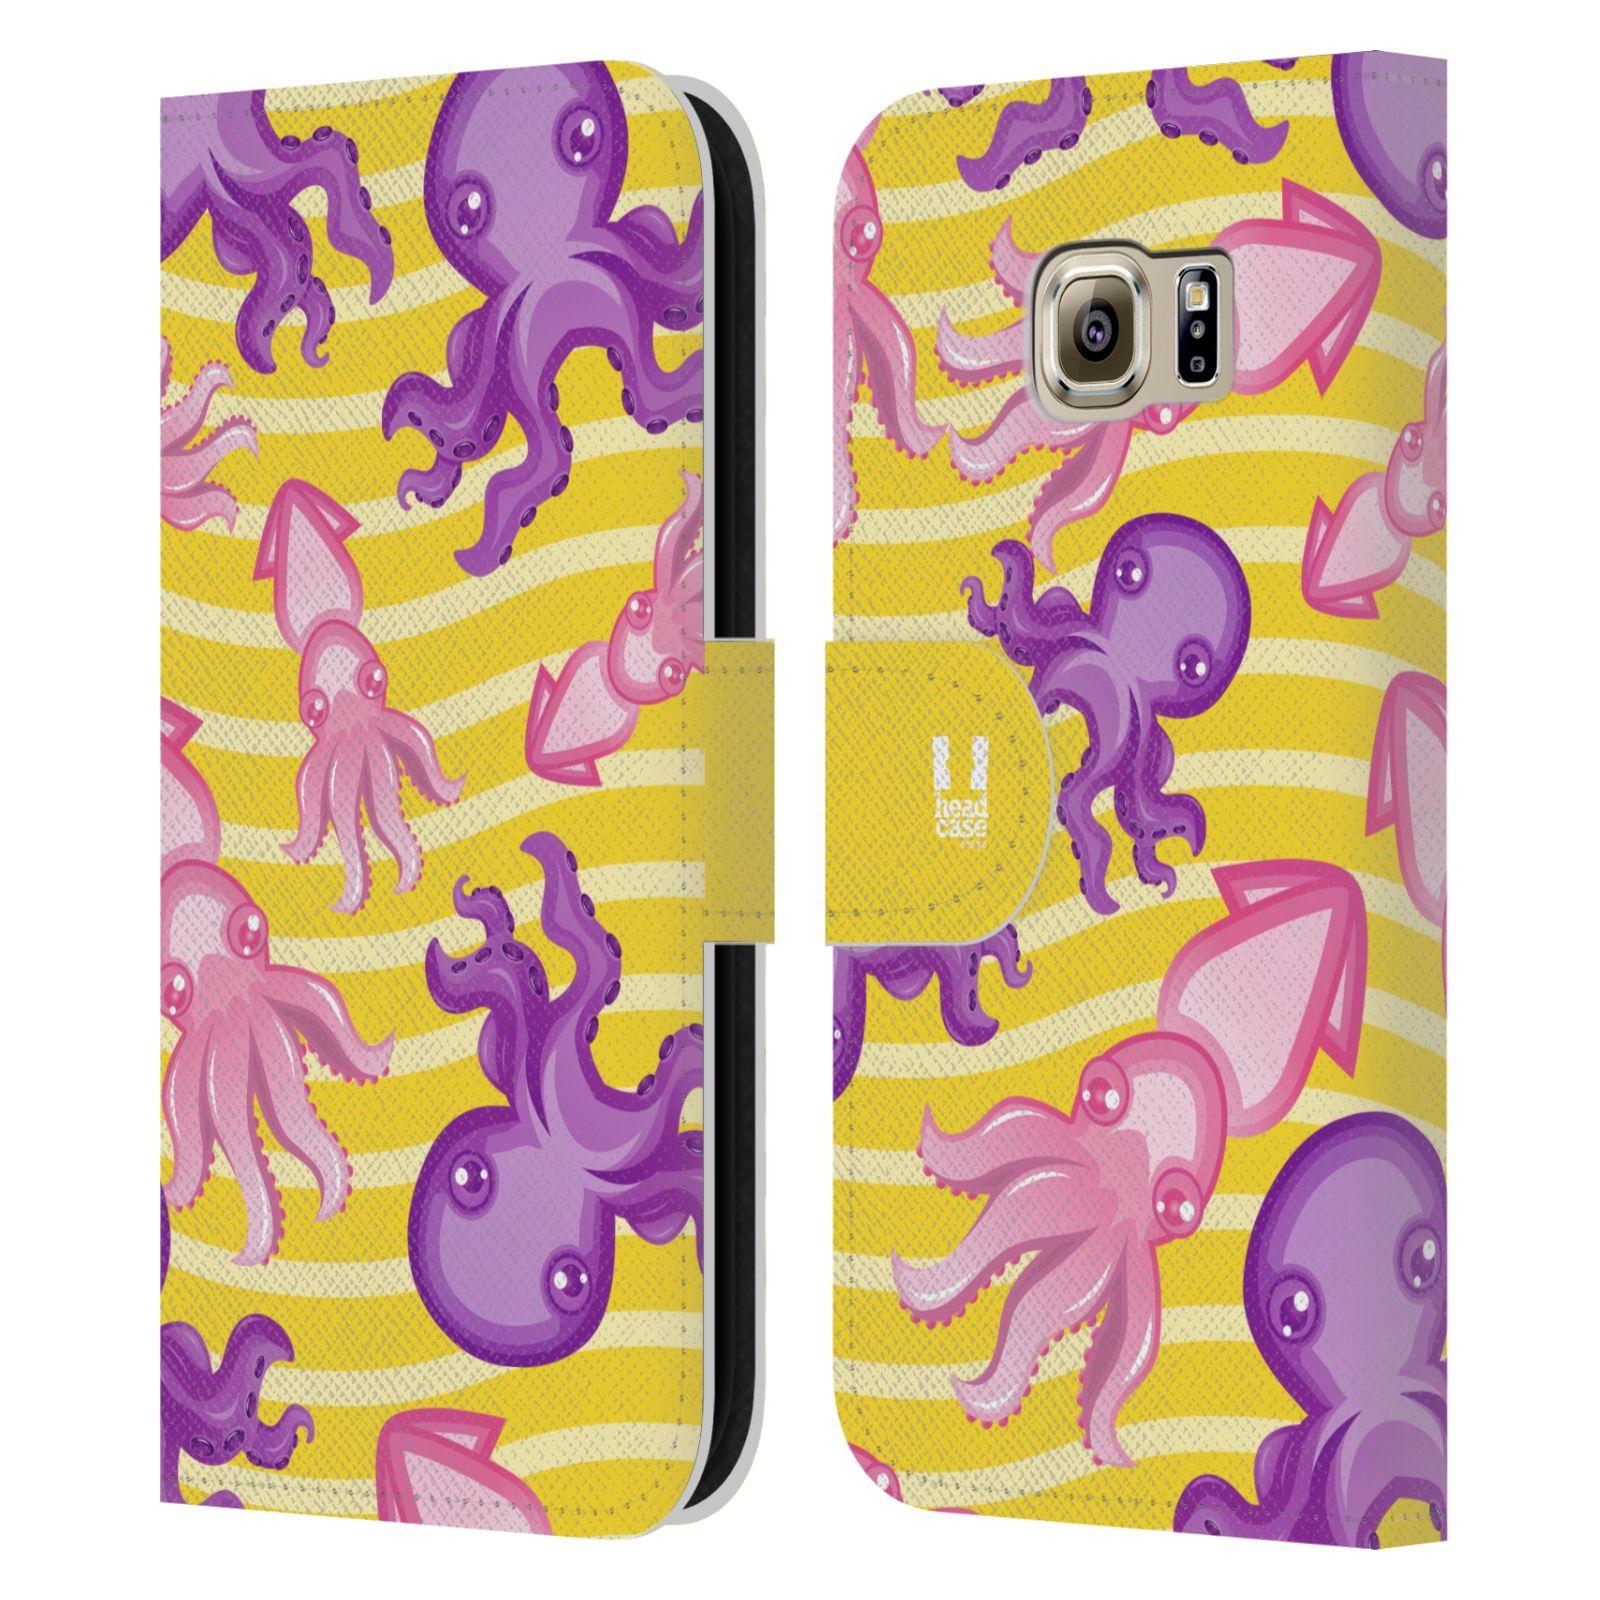 HEAD CASE Flipové pouzdro pro mobil Samsung Galaxy S6 (G9200) Mořský živočich chobotnice a krakatice žlutá barva